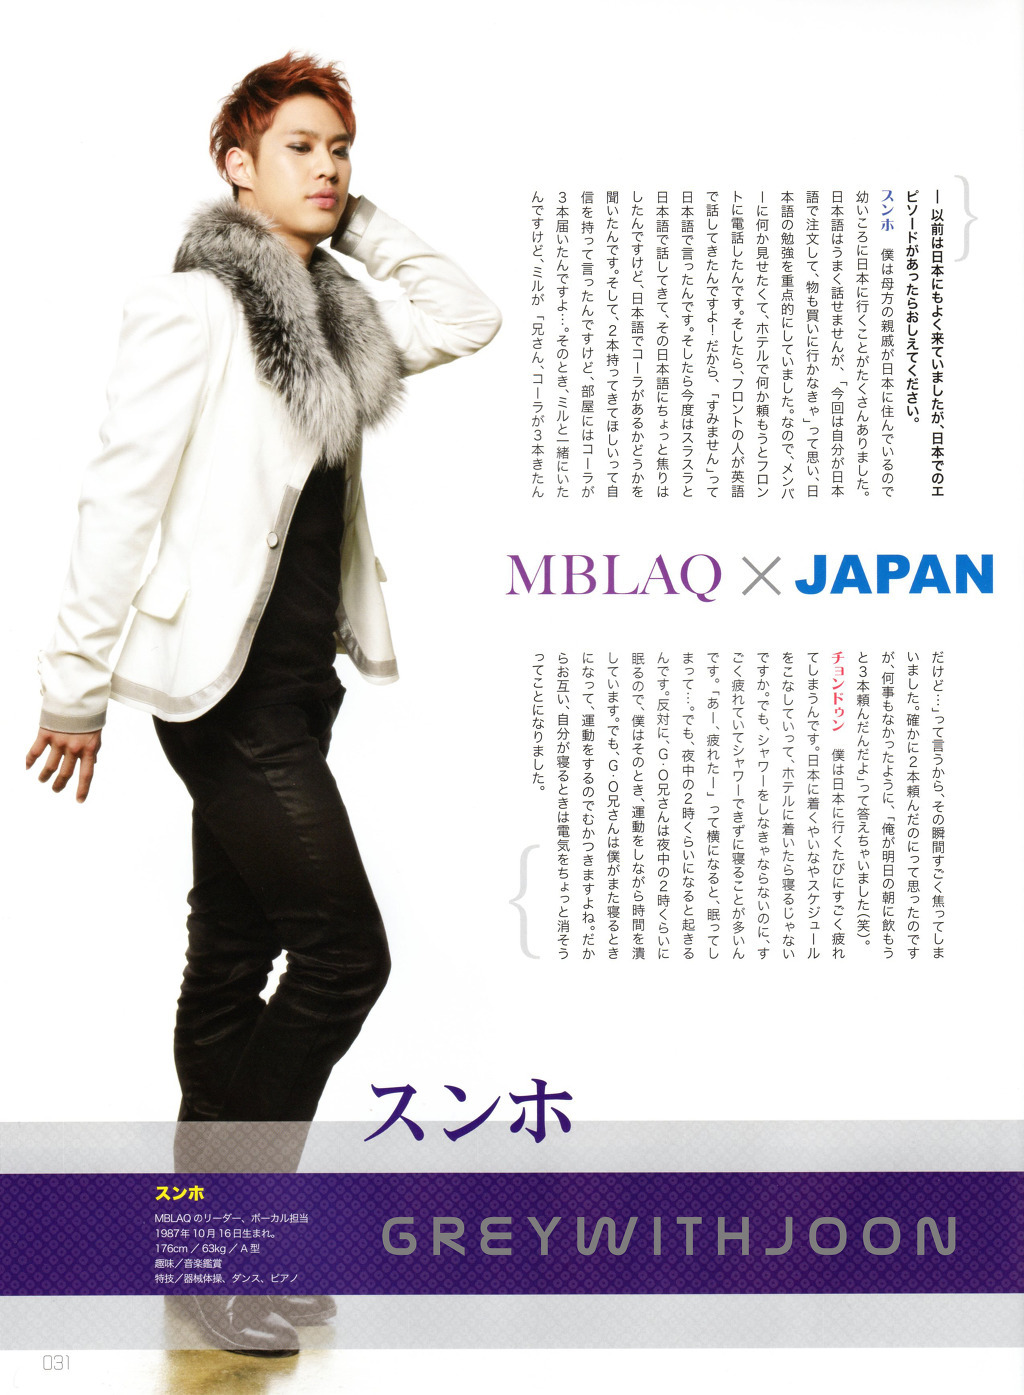 [01.03.11]MBLAQ @ CREA STAR Scan10